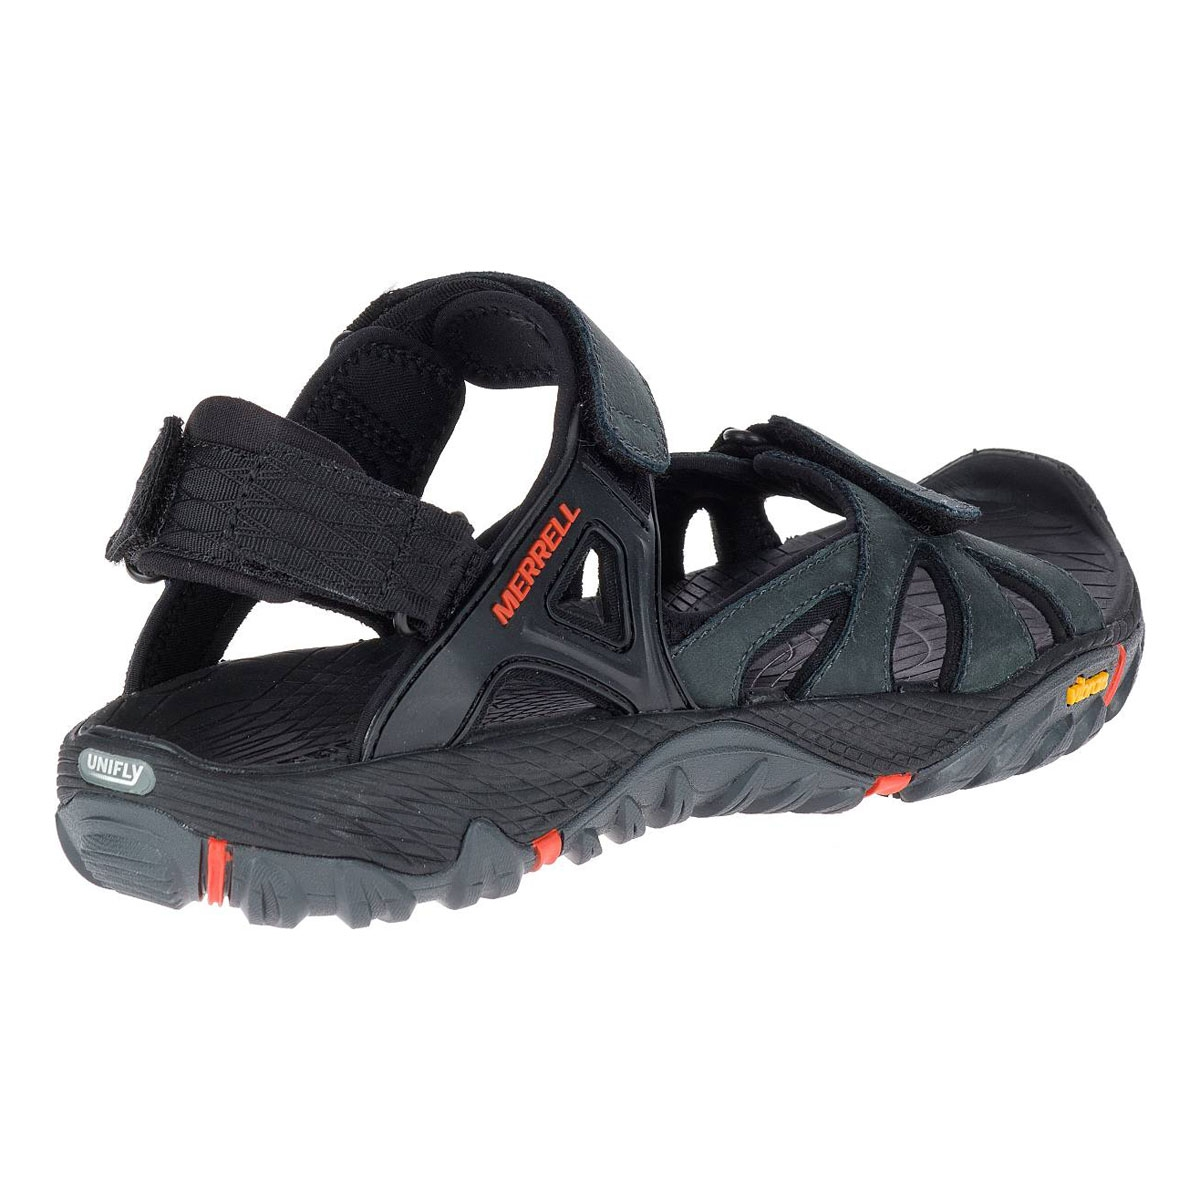 b821c603ea82 ... Image of Merrell All Out Blaze Sieve Convert Sandals (Men s) - Dark  Slate ...